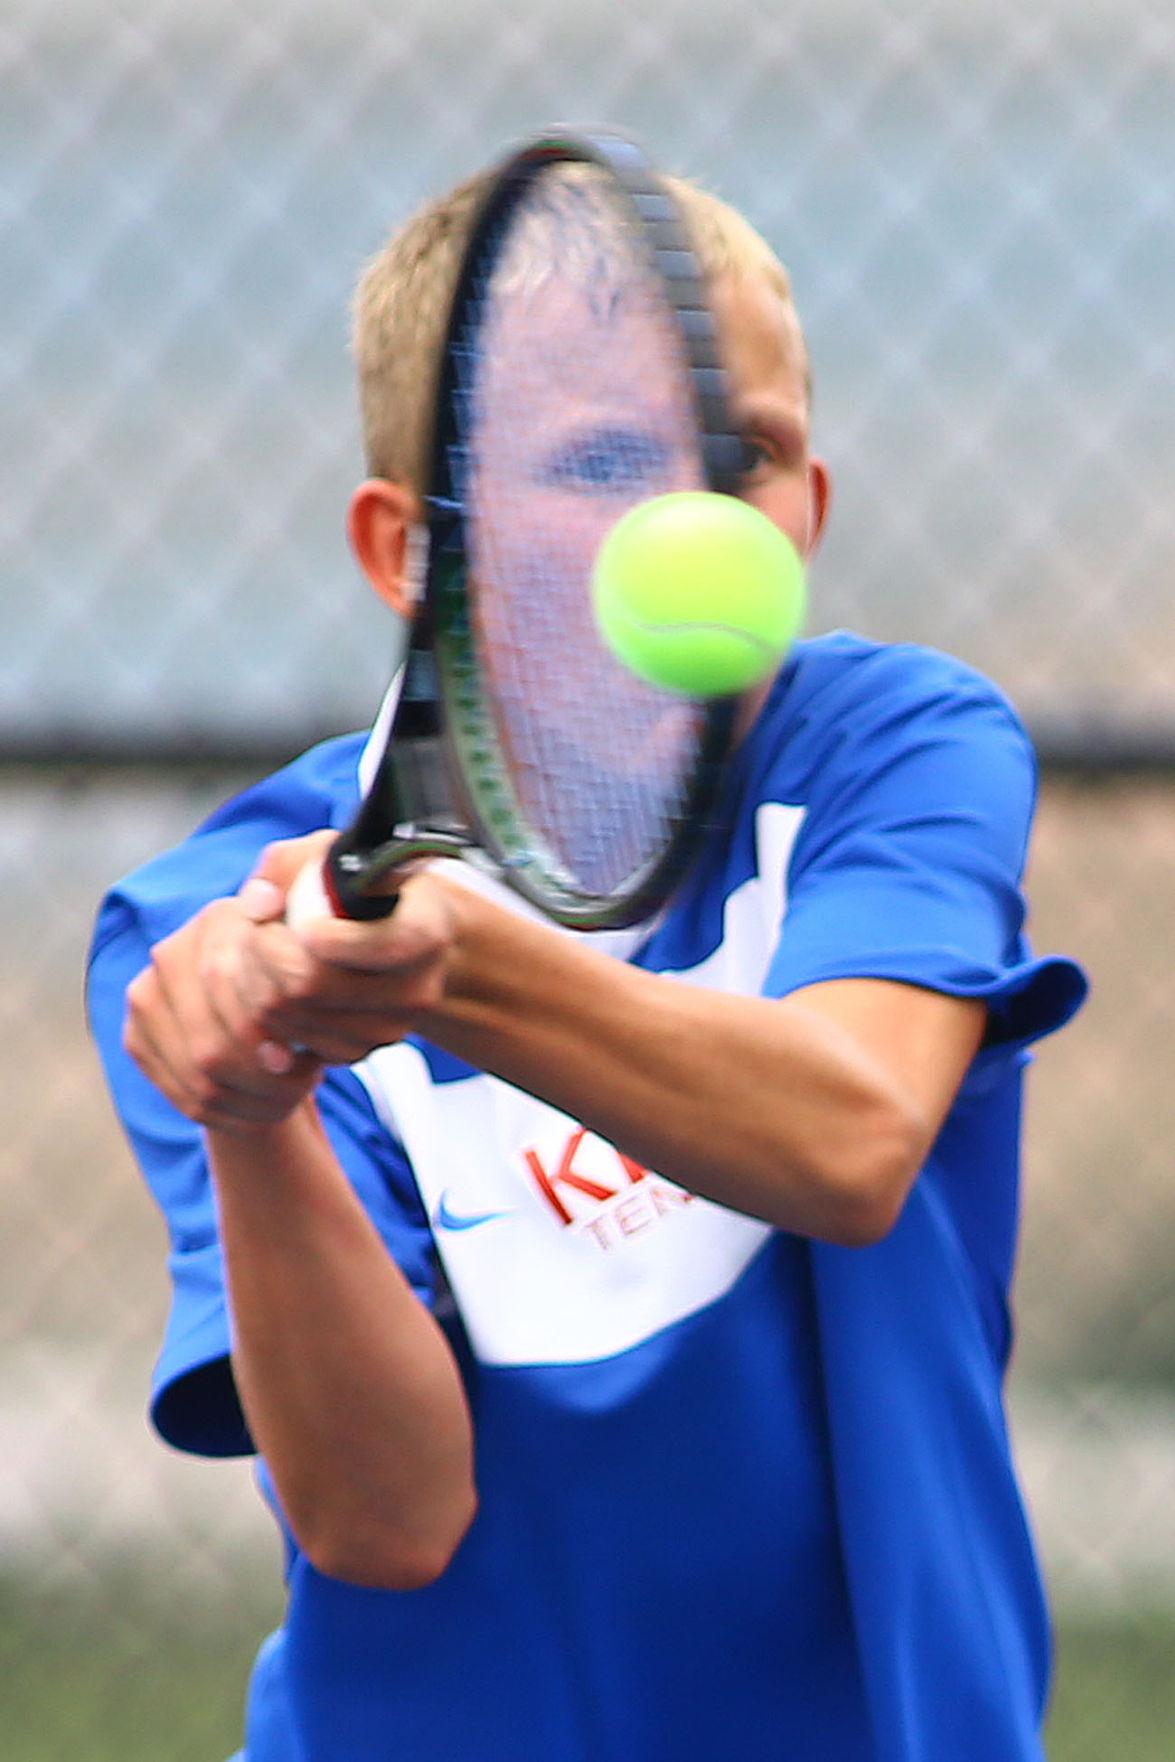 sofa sport tennis bed informa 2017 sectional sports kokomotribune